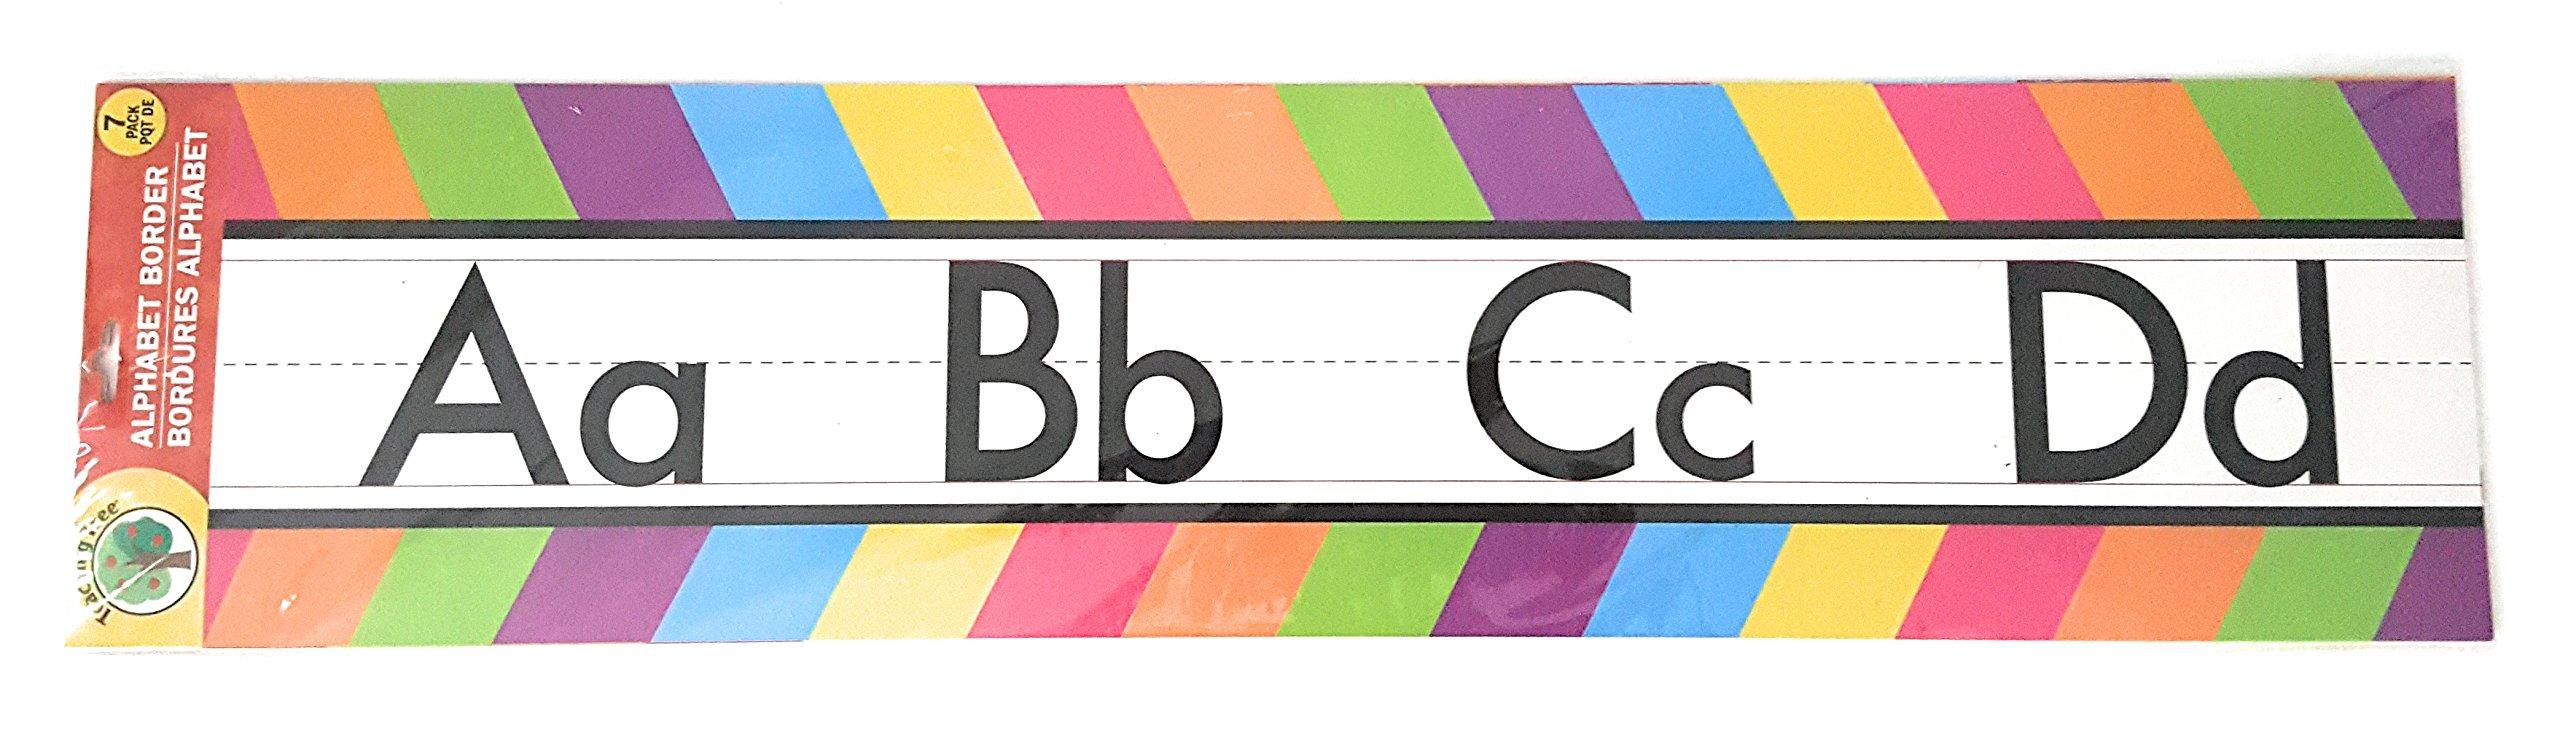 Teaching Tree Manuscript Alphabet Bulletin Back to School Board Creative Strips School Office Resources Scholastic Teacher Teacher's Bulletin Trim Wall Border Decal Classroom Decoration Colored Strips